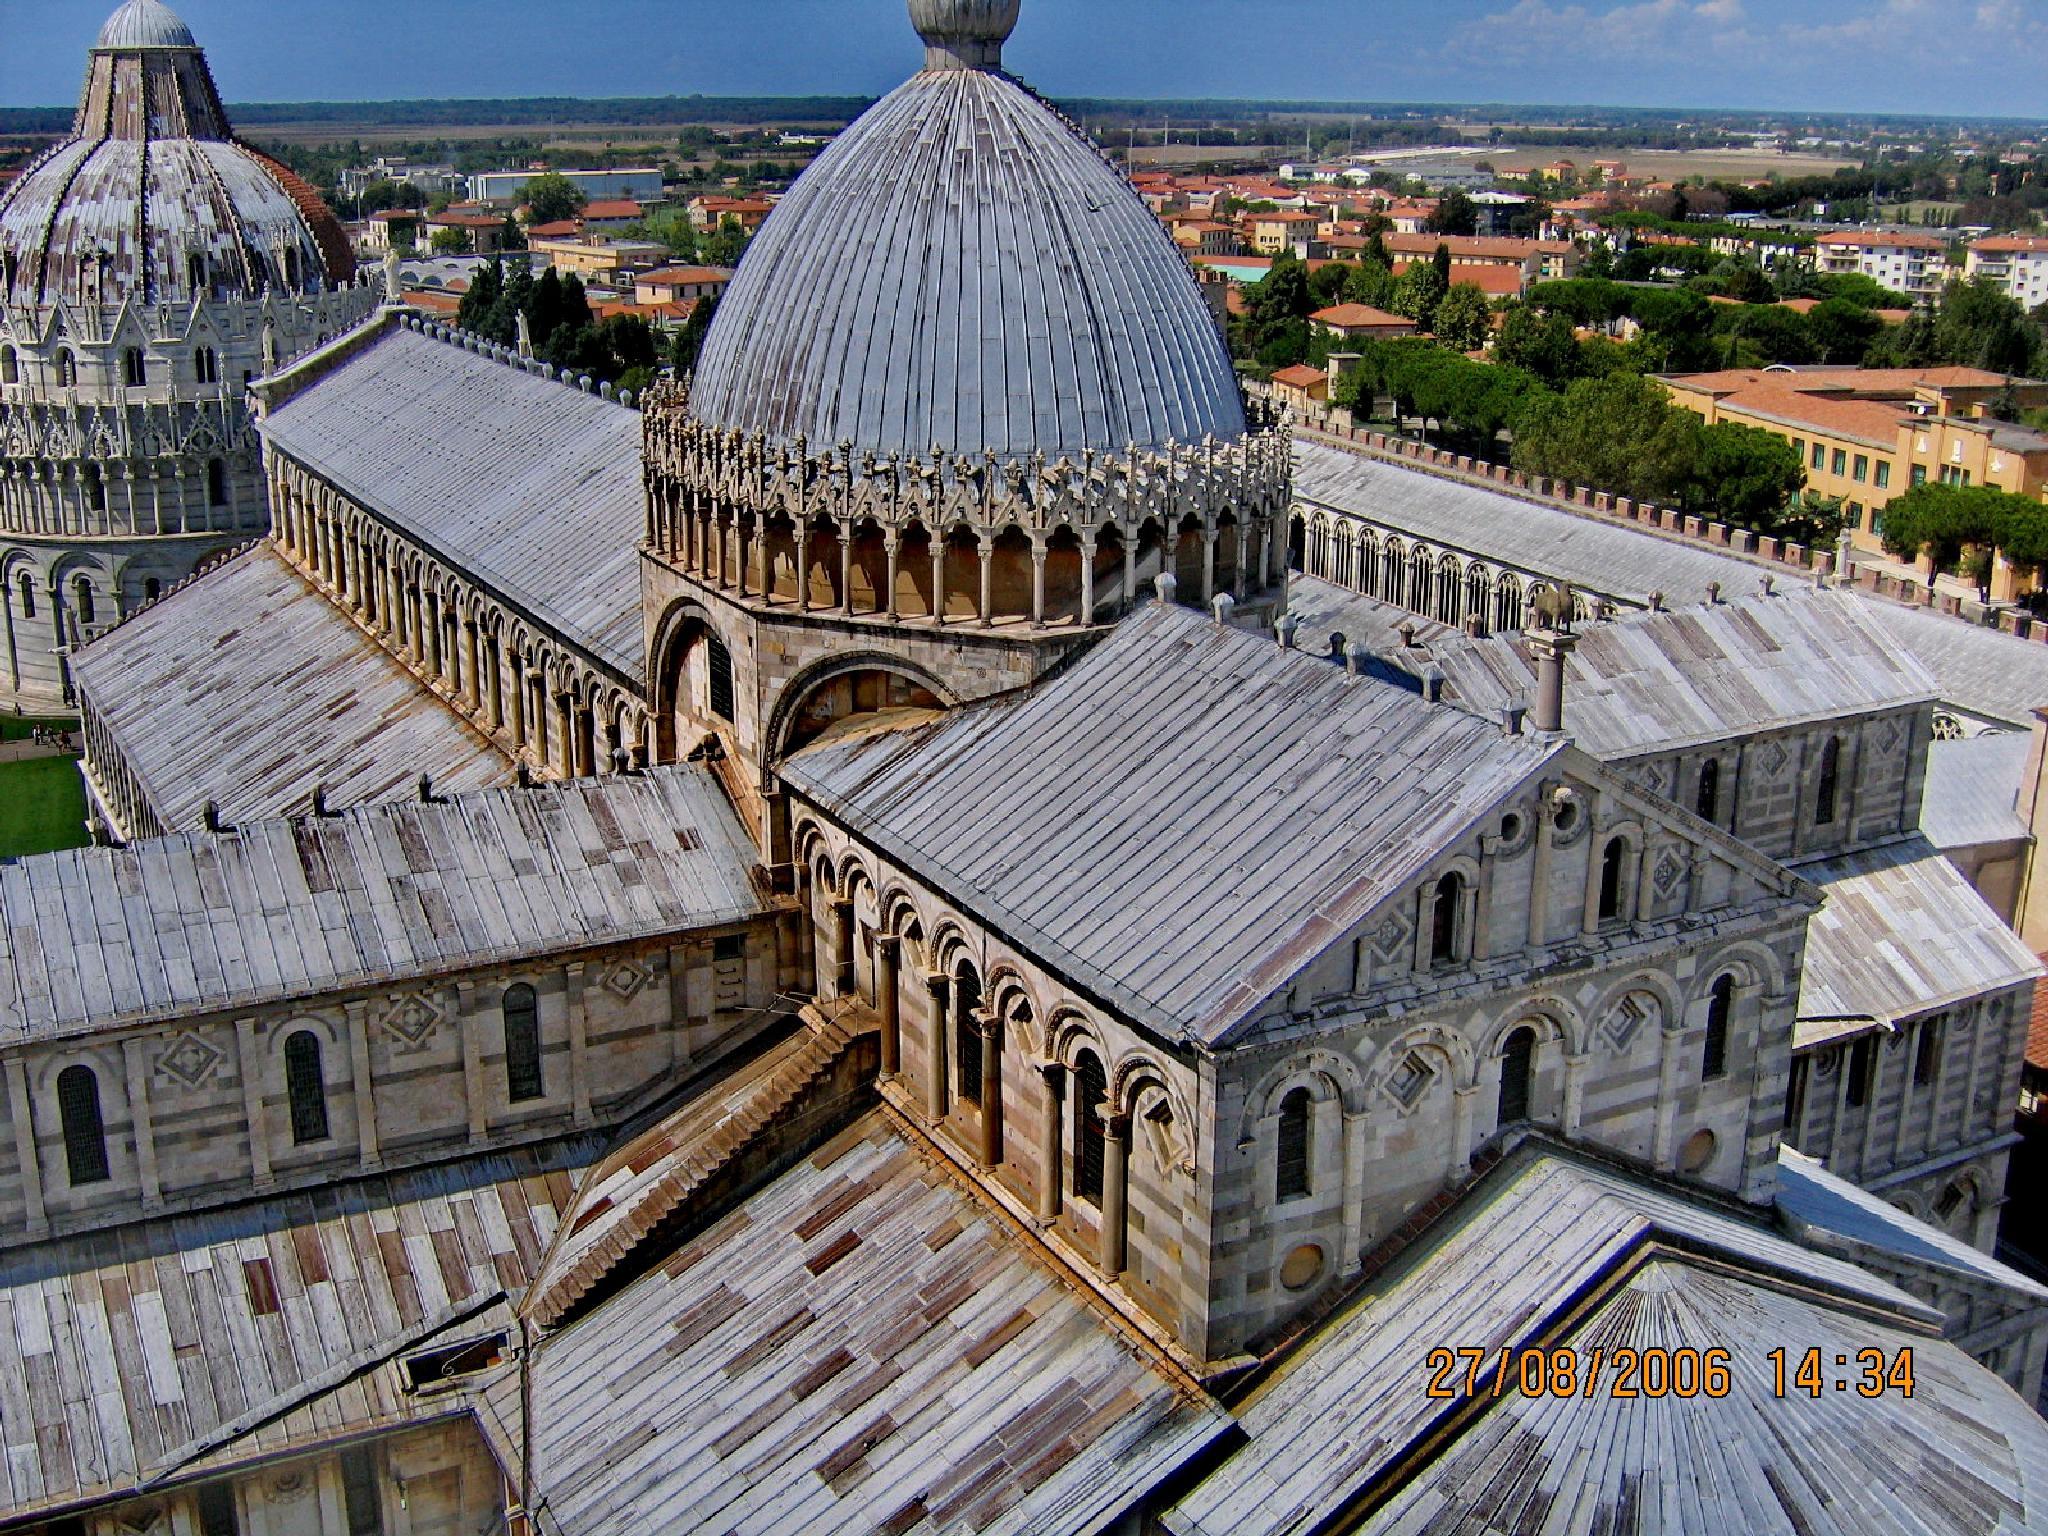 The Dome from Pisa by Irina Carmen Brinza